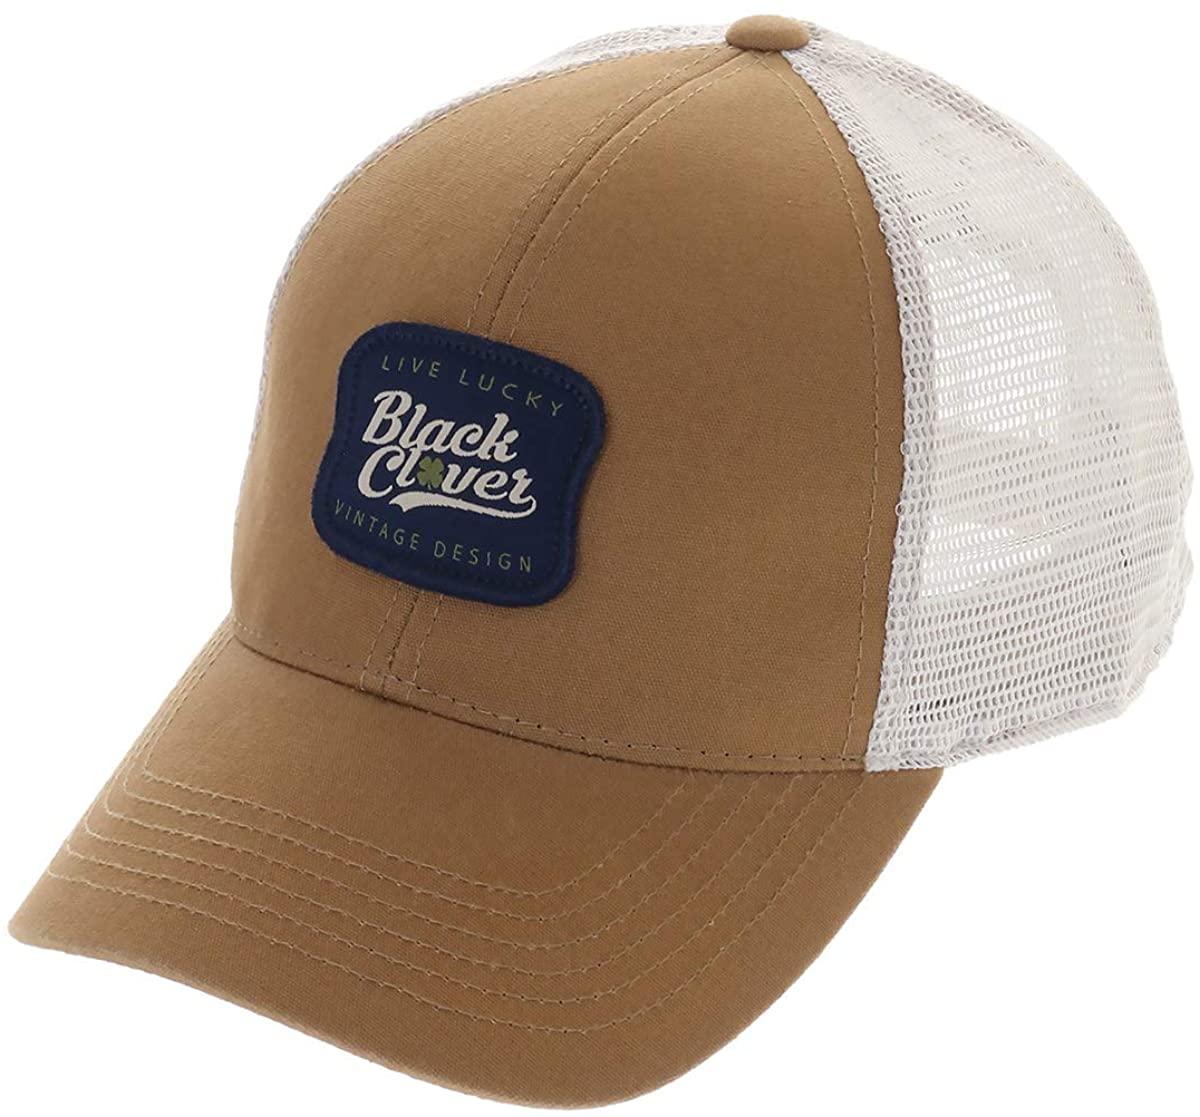 Black Clover Vintage Patch Adjustable Cap